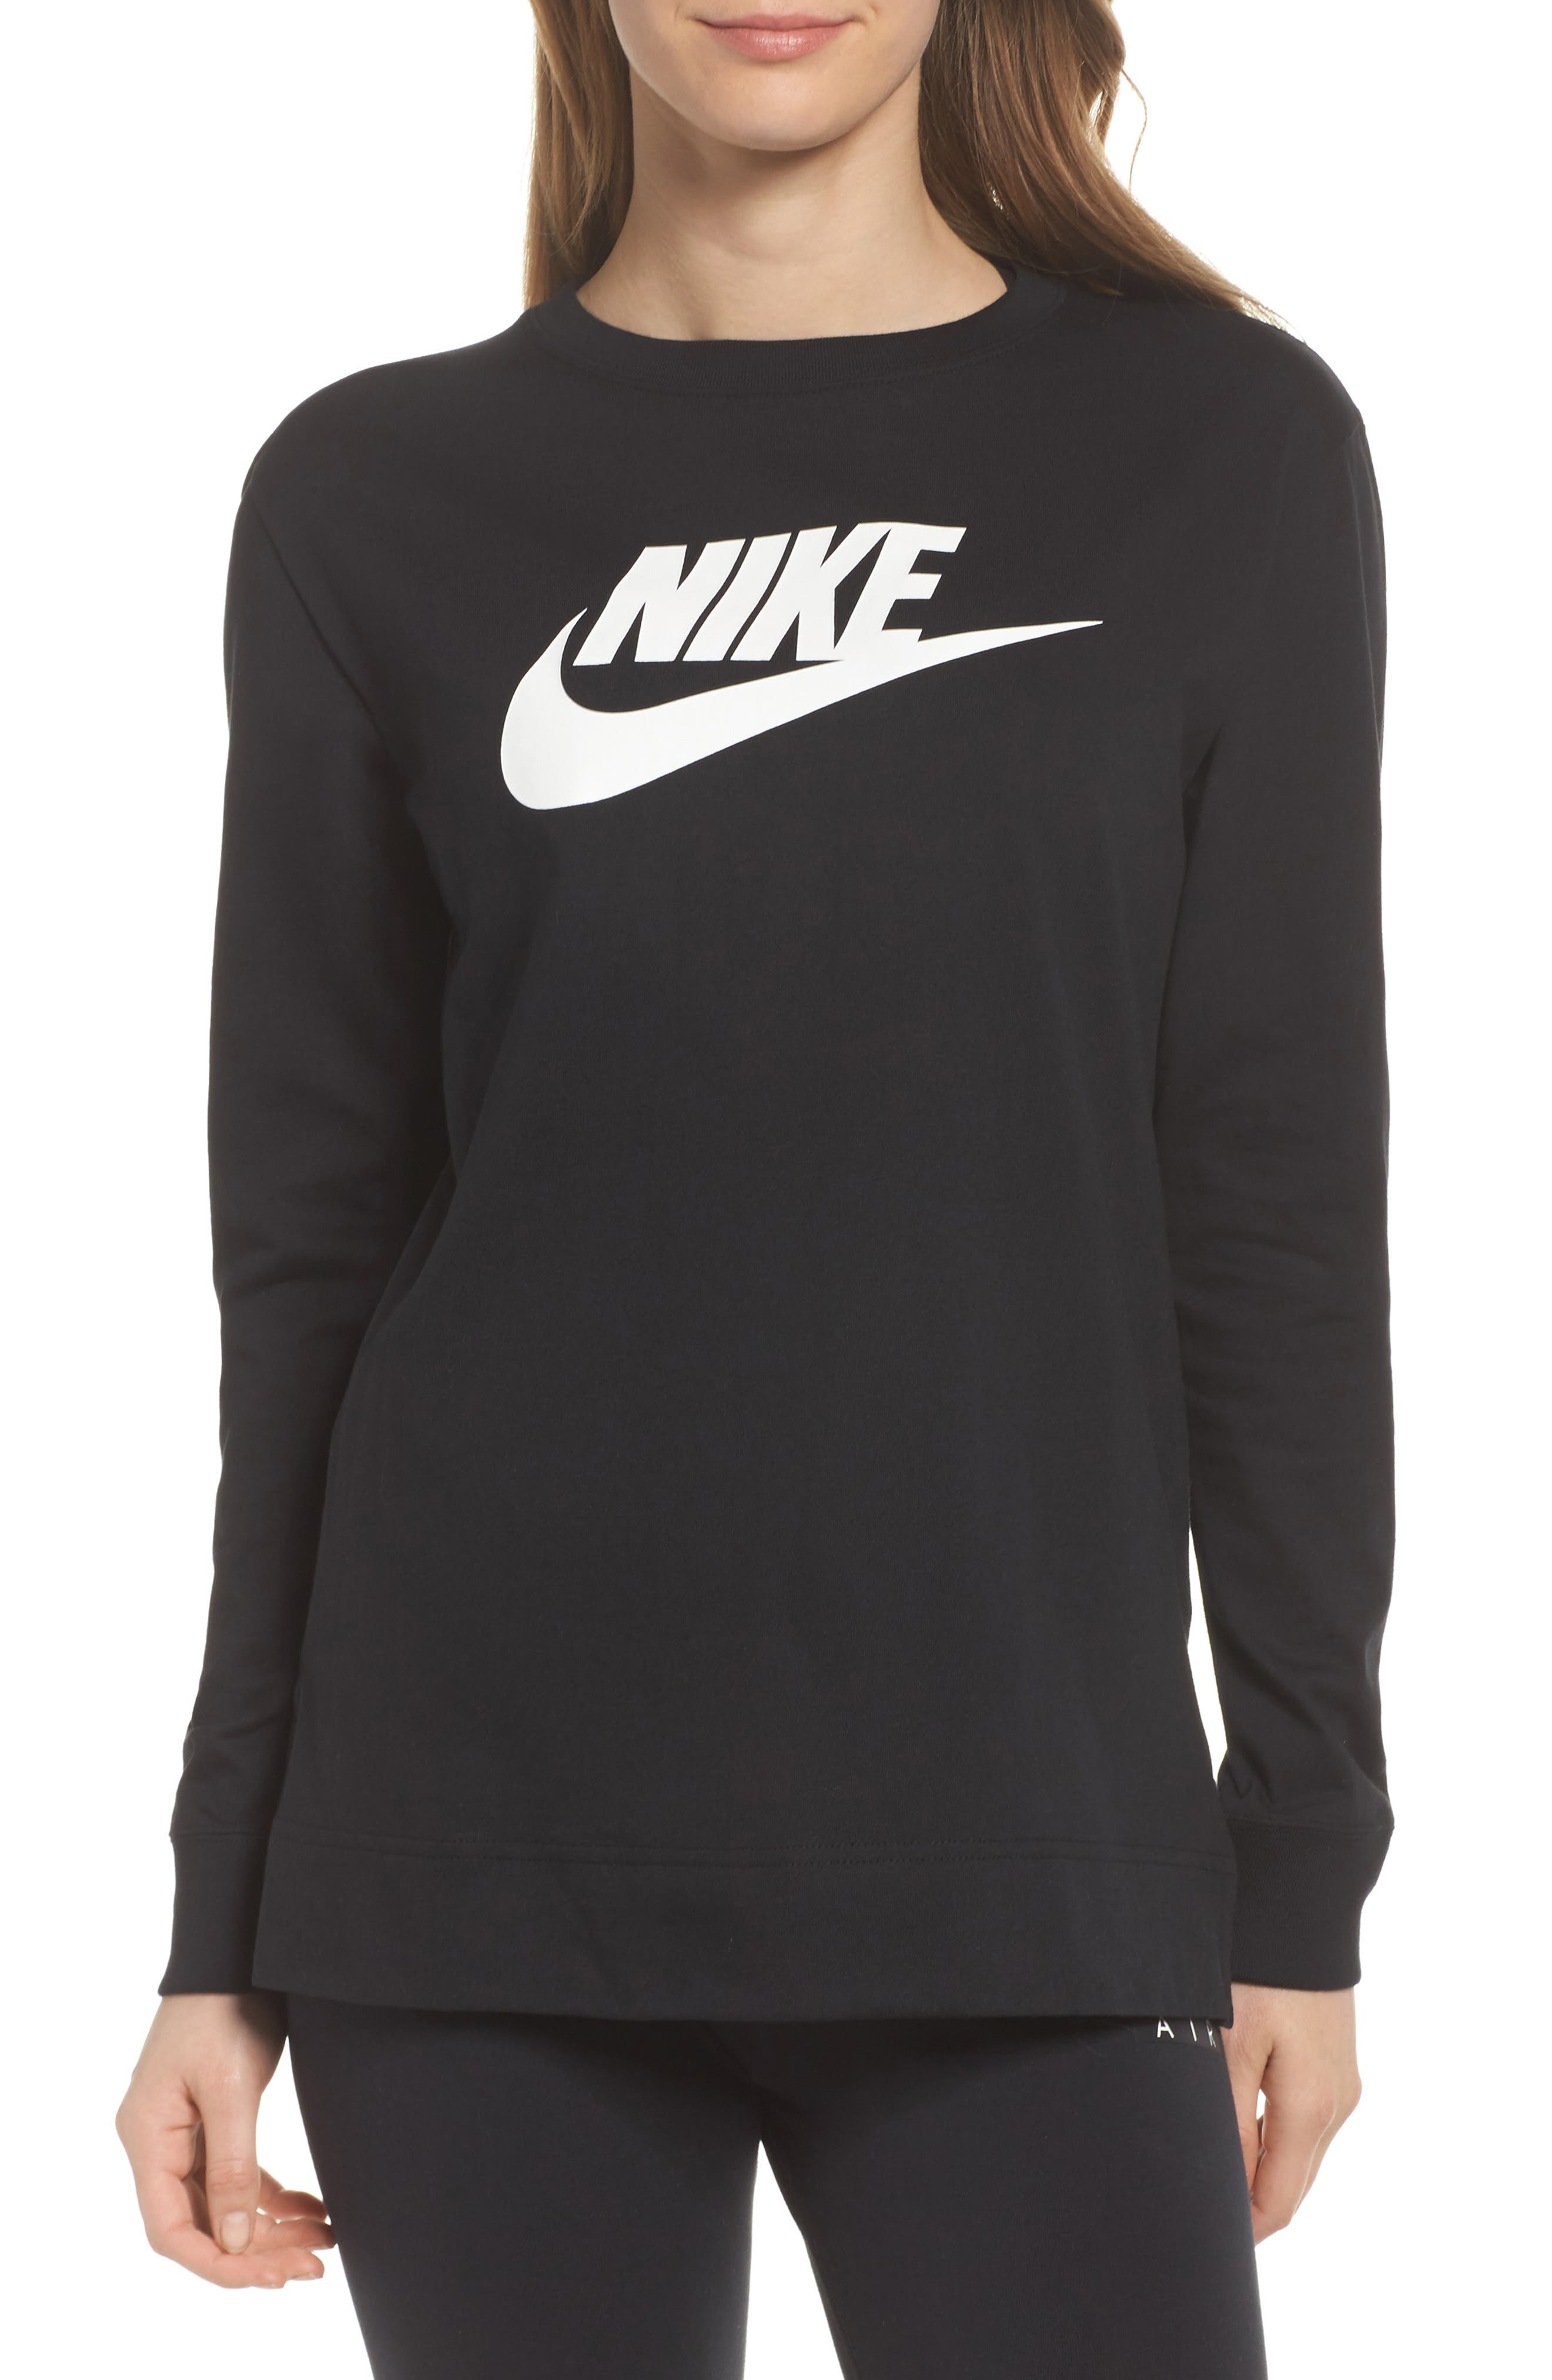 Sportswear HBR Women's Long Sleeve Tee,                             Alternate thumbnail 3, color,                             010